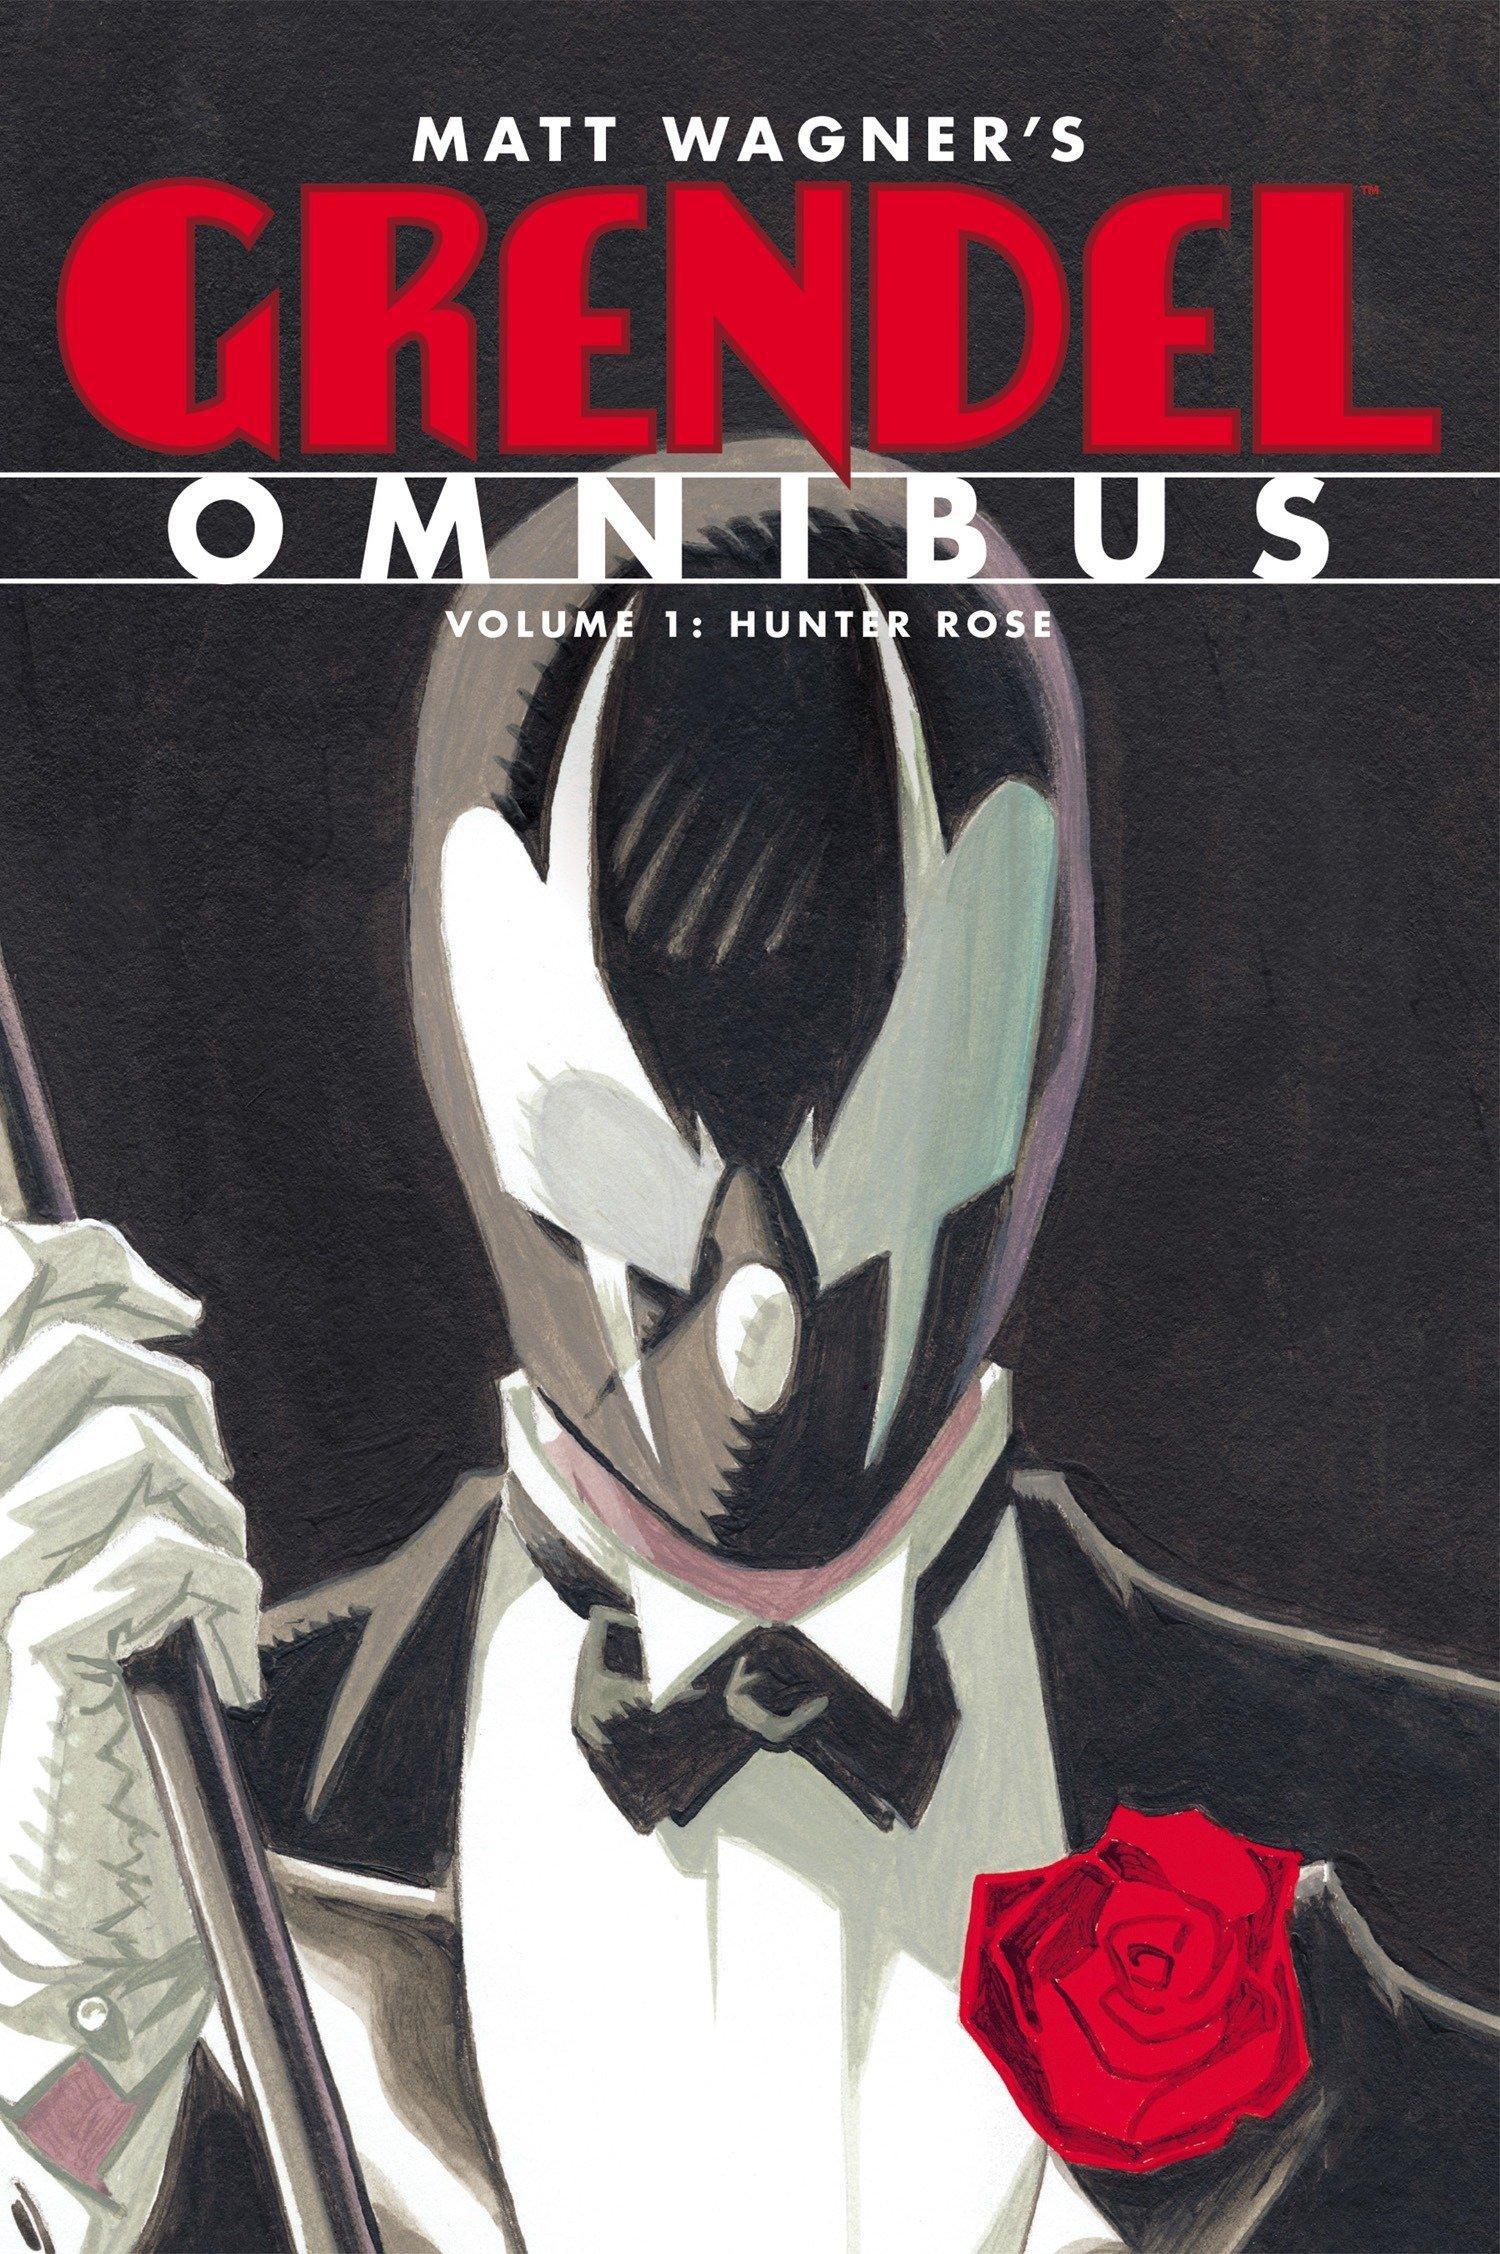 The Story – Grendel Omnibus Vol. 1 – 4 (2012-2013)